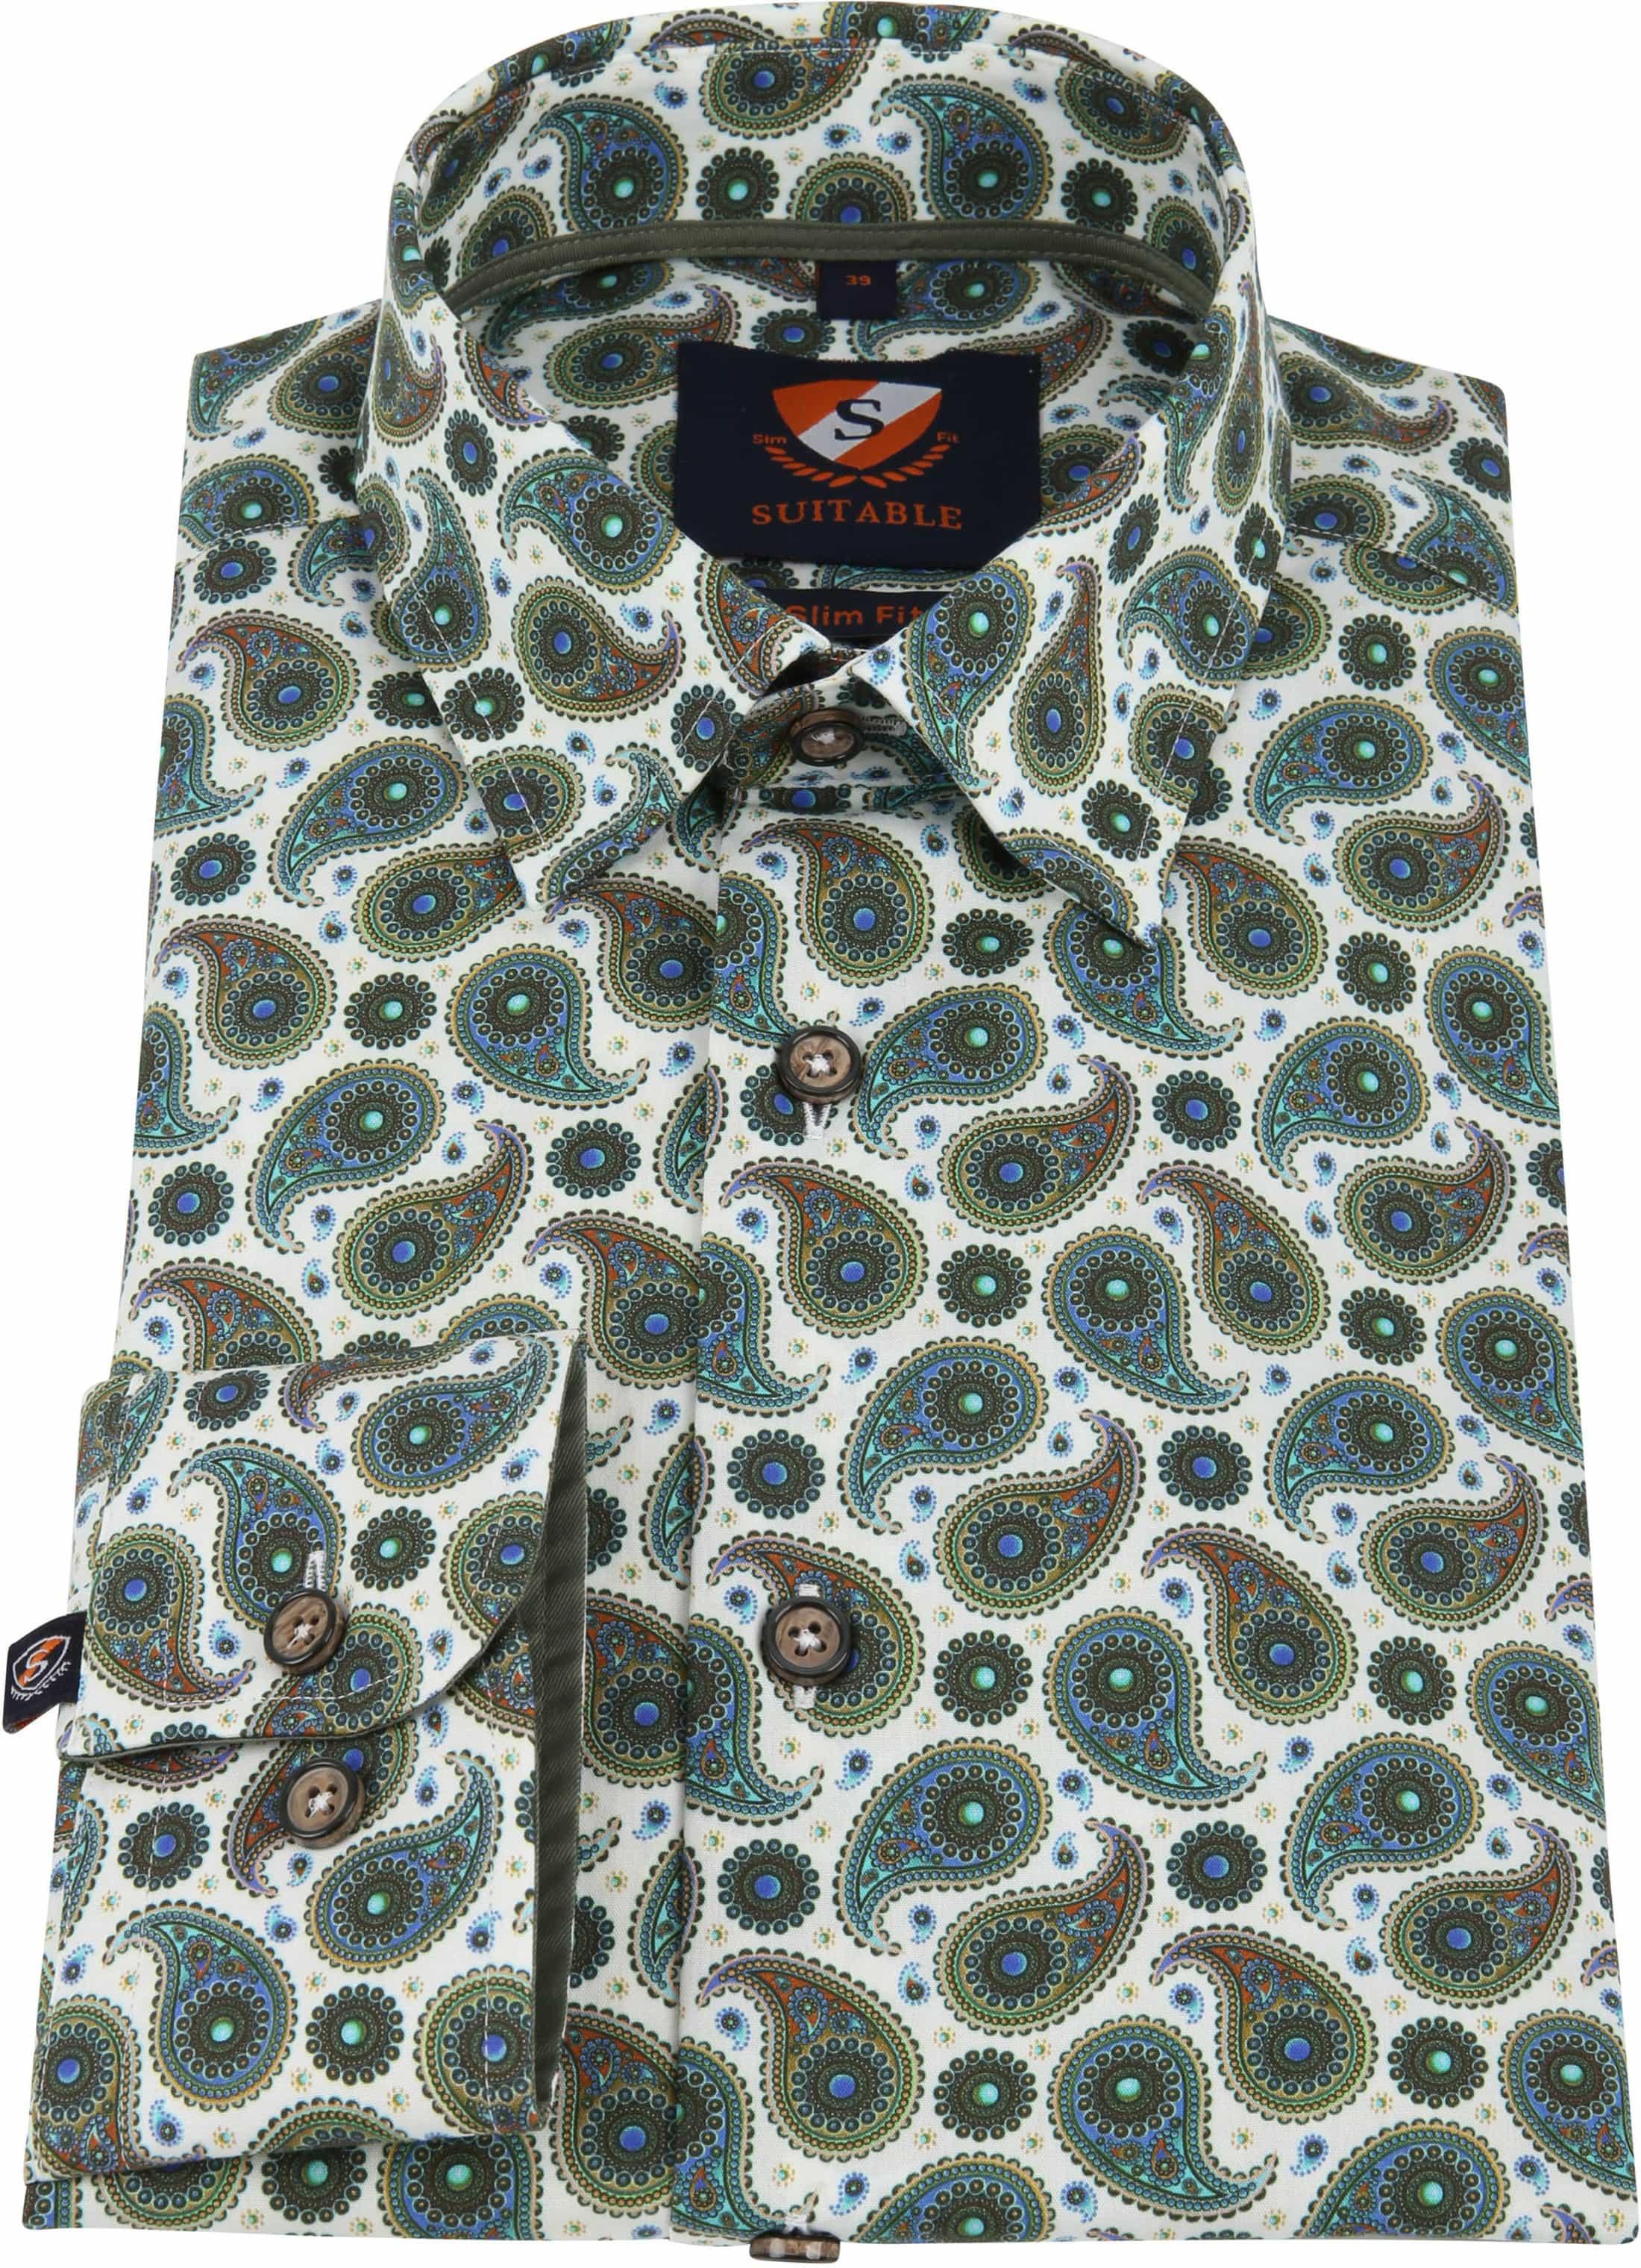 Suitable Overhemd HBD Paisley Groen foto 3